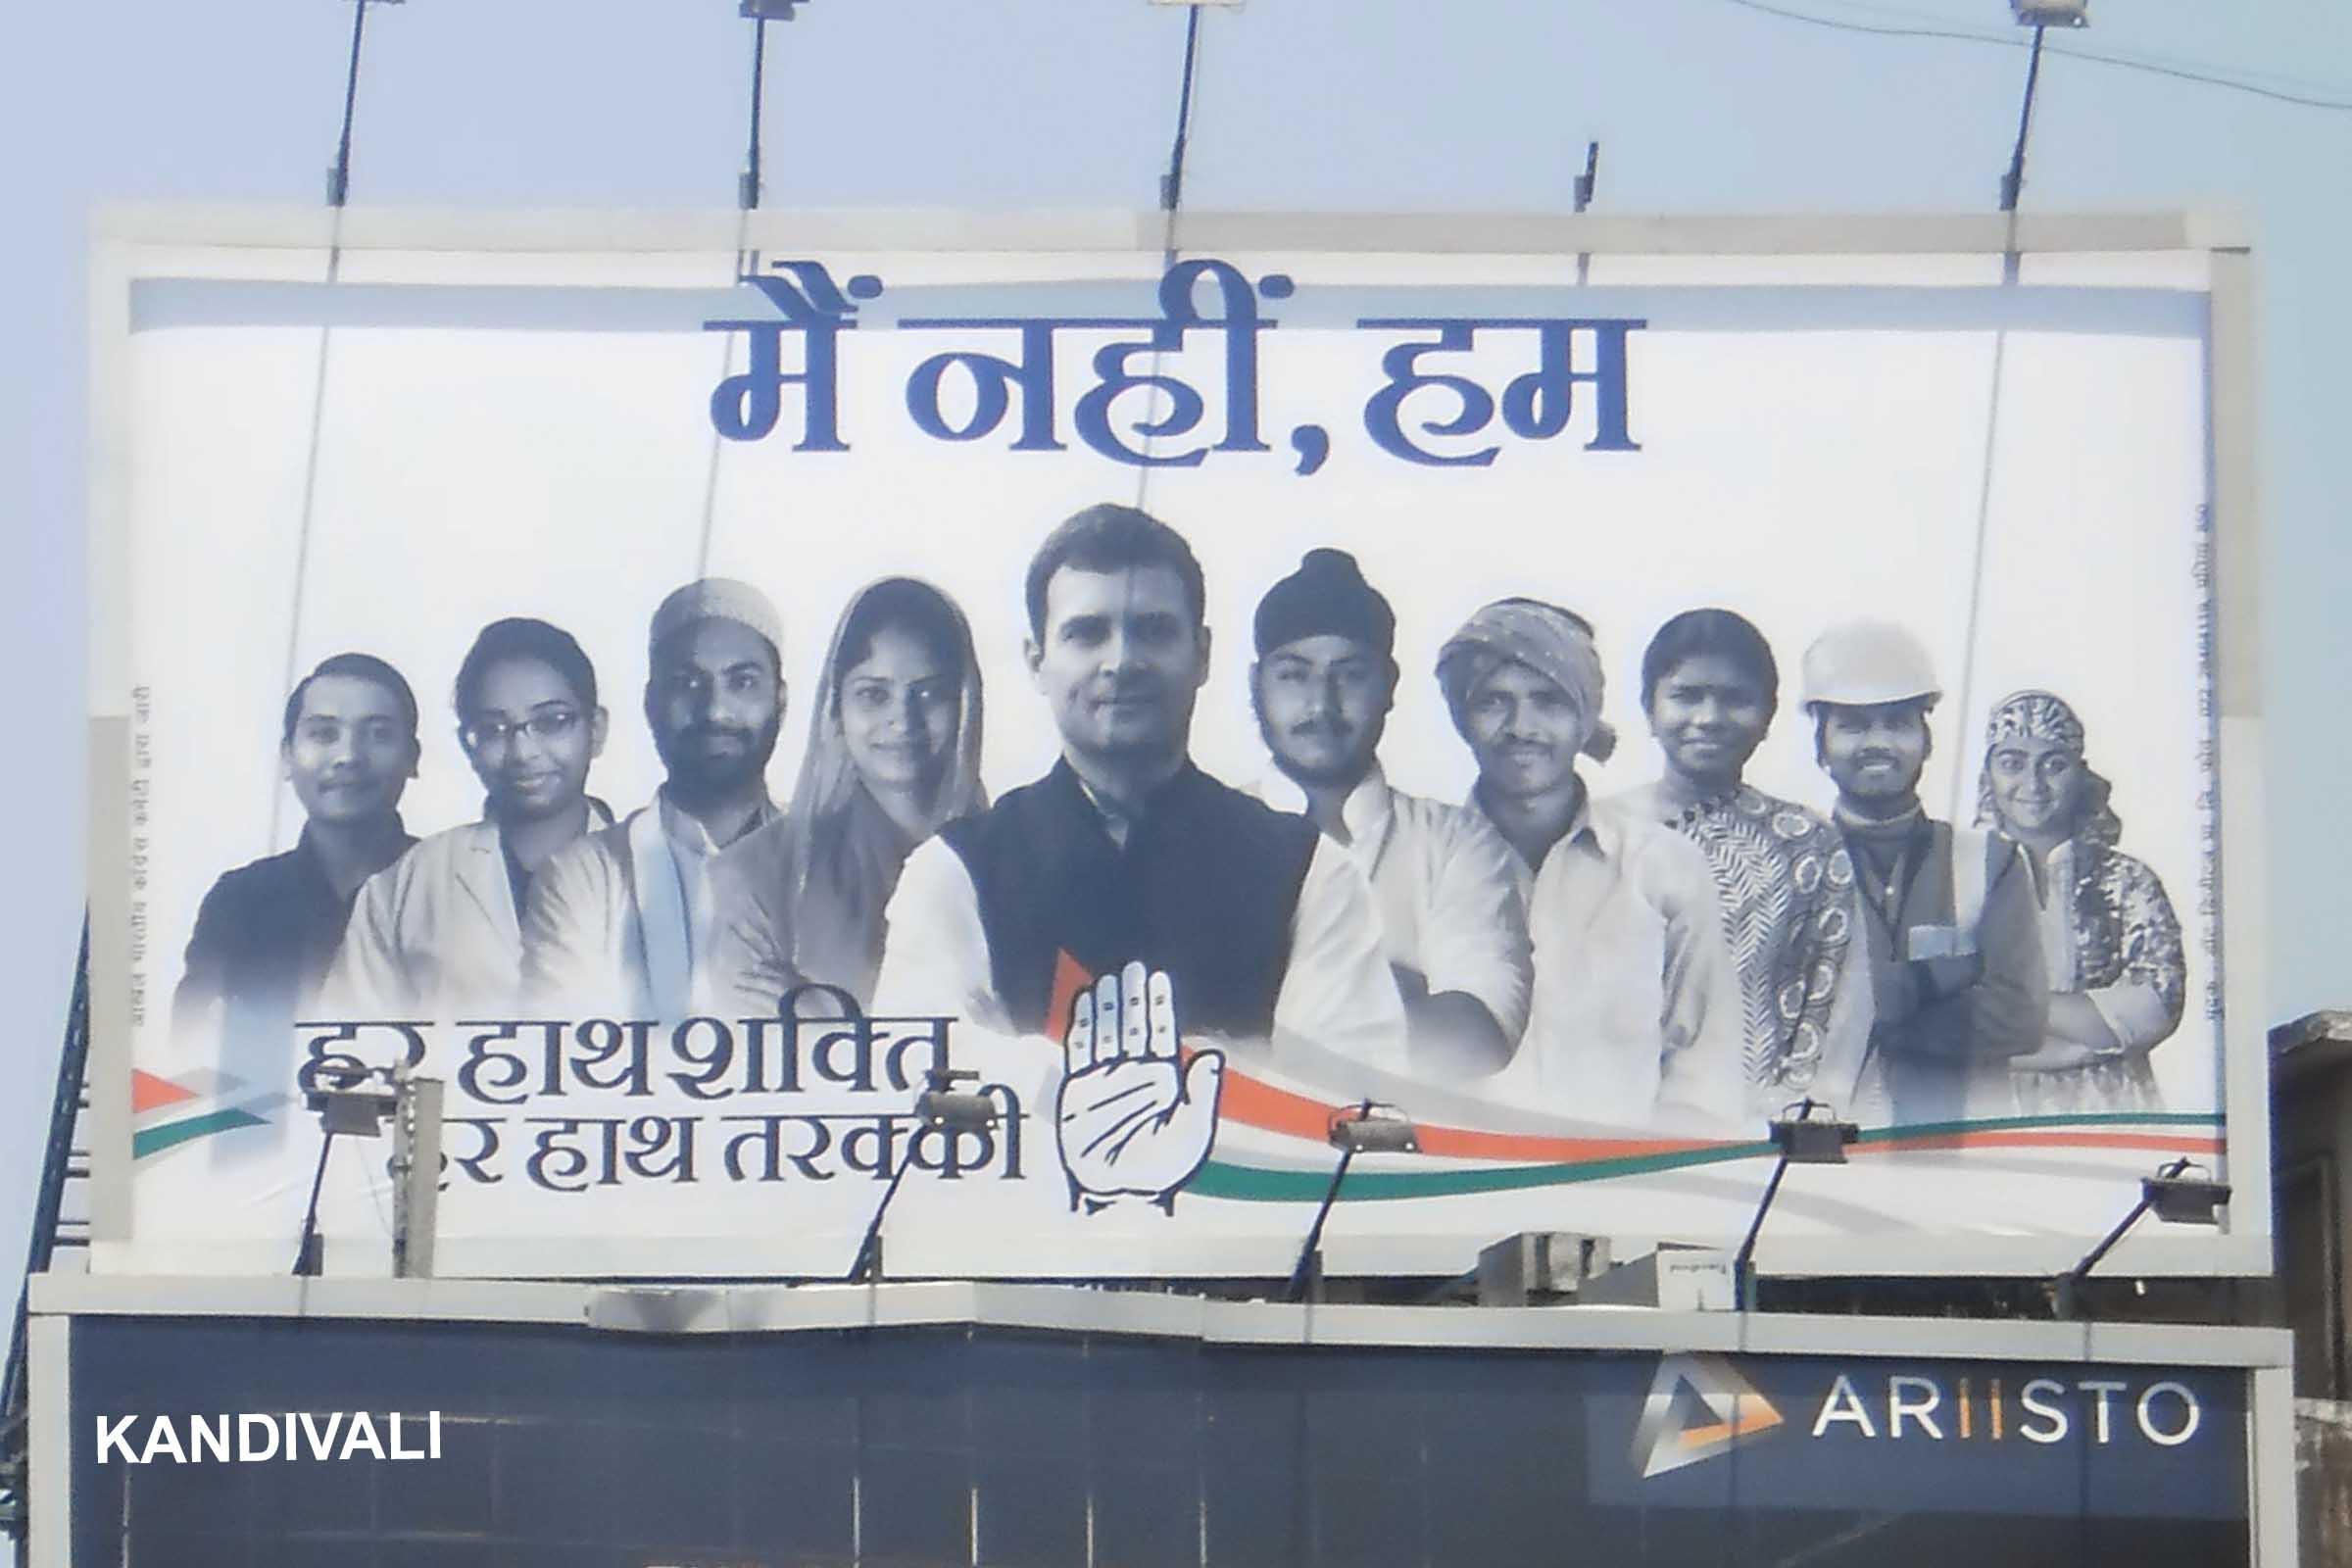 maharashtra billboards elections के लिए चित्र परिणाम